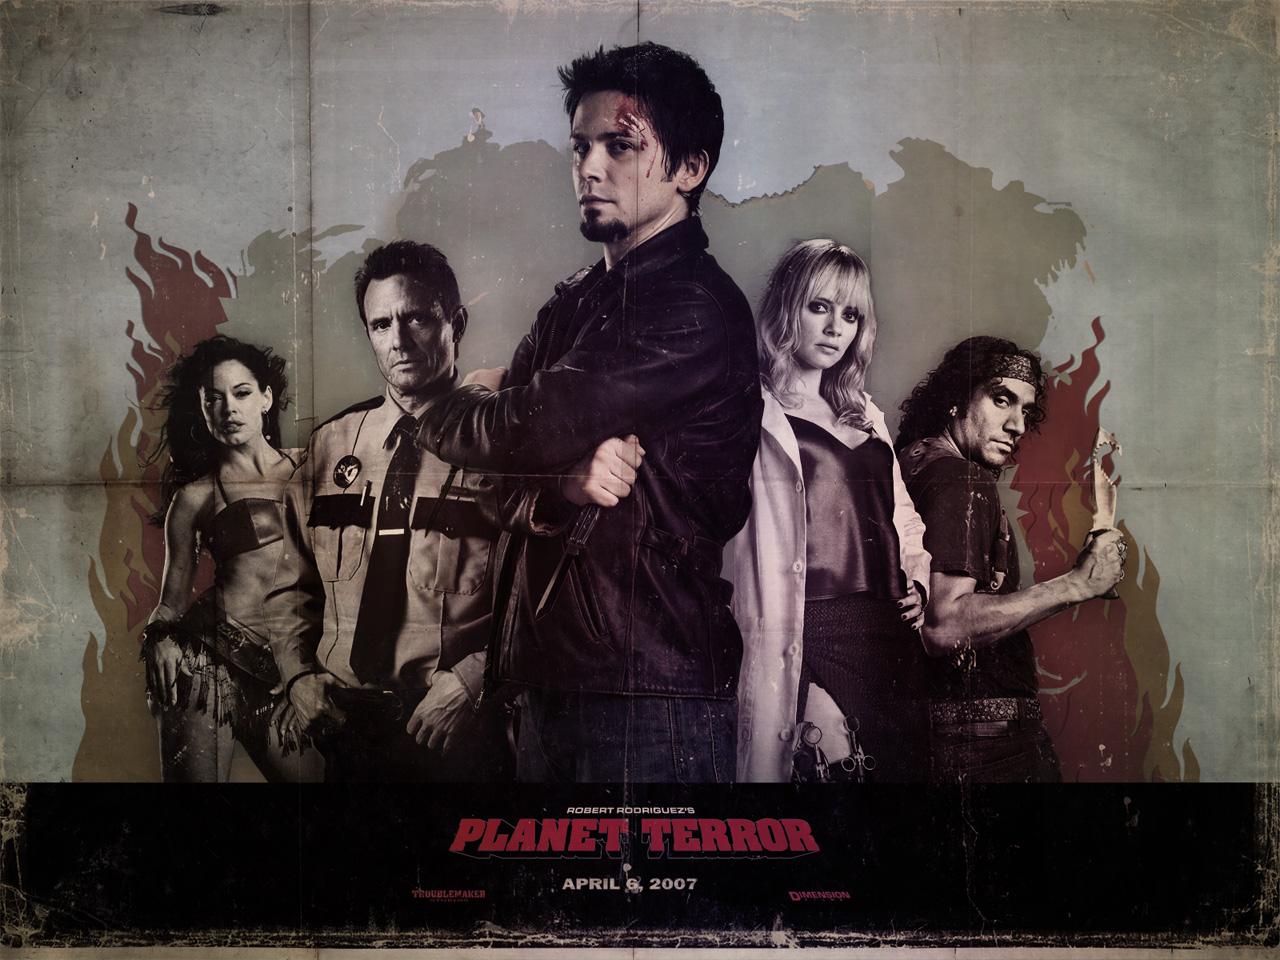 planet-terror-Planet-Terror-jpg-Desktop-Cool-Free-Planet-Terror-movie-wallpaper-wp4609253